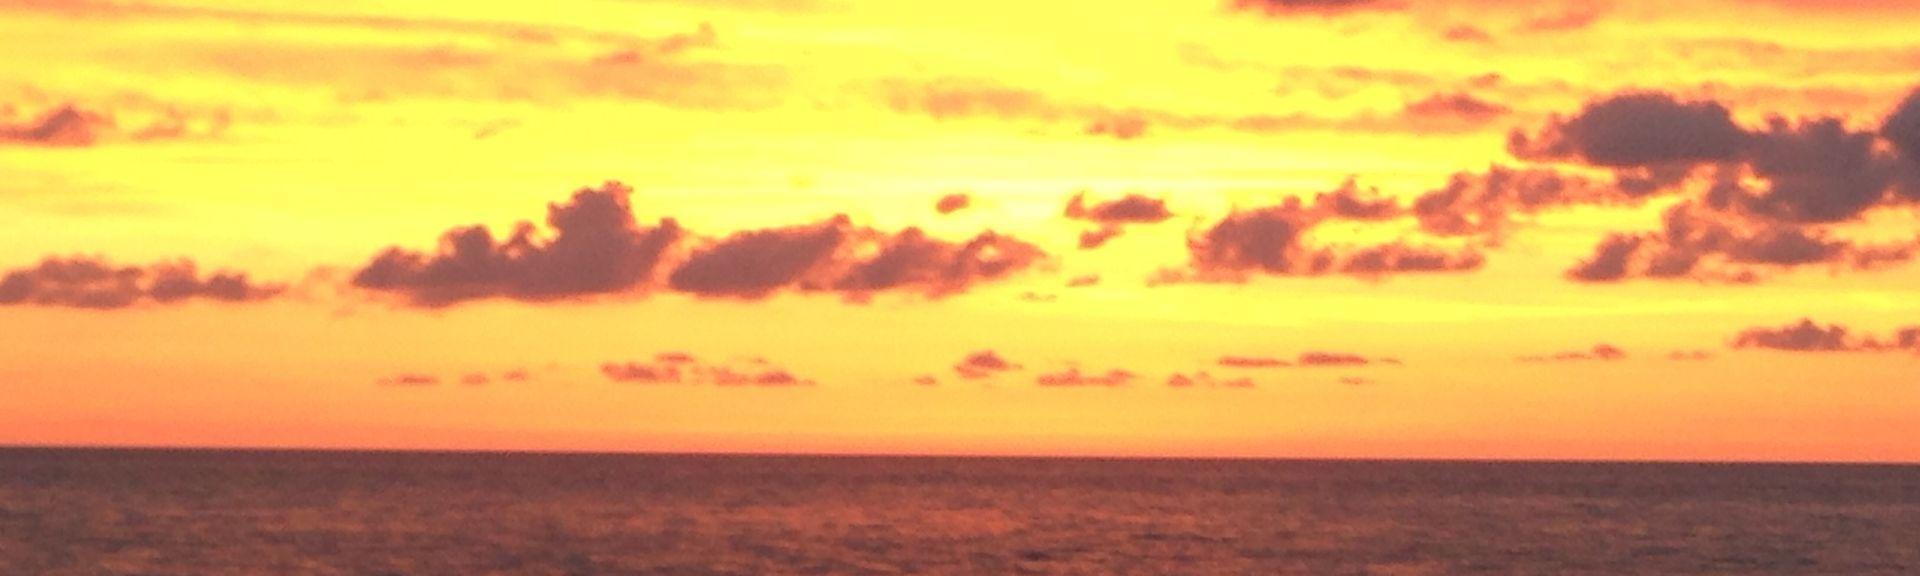 Naples Bay, Naples, Flórida, Estados Unidos